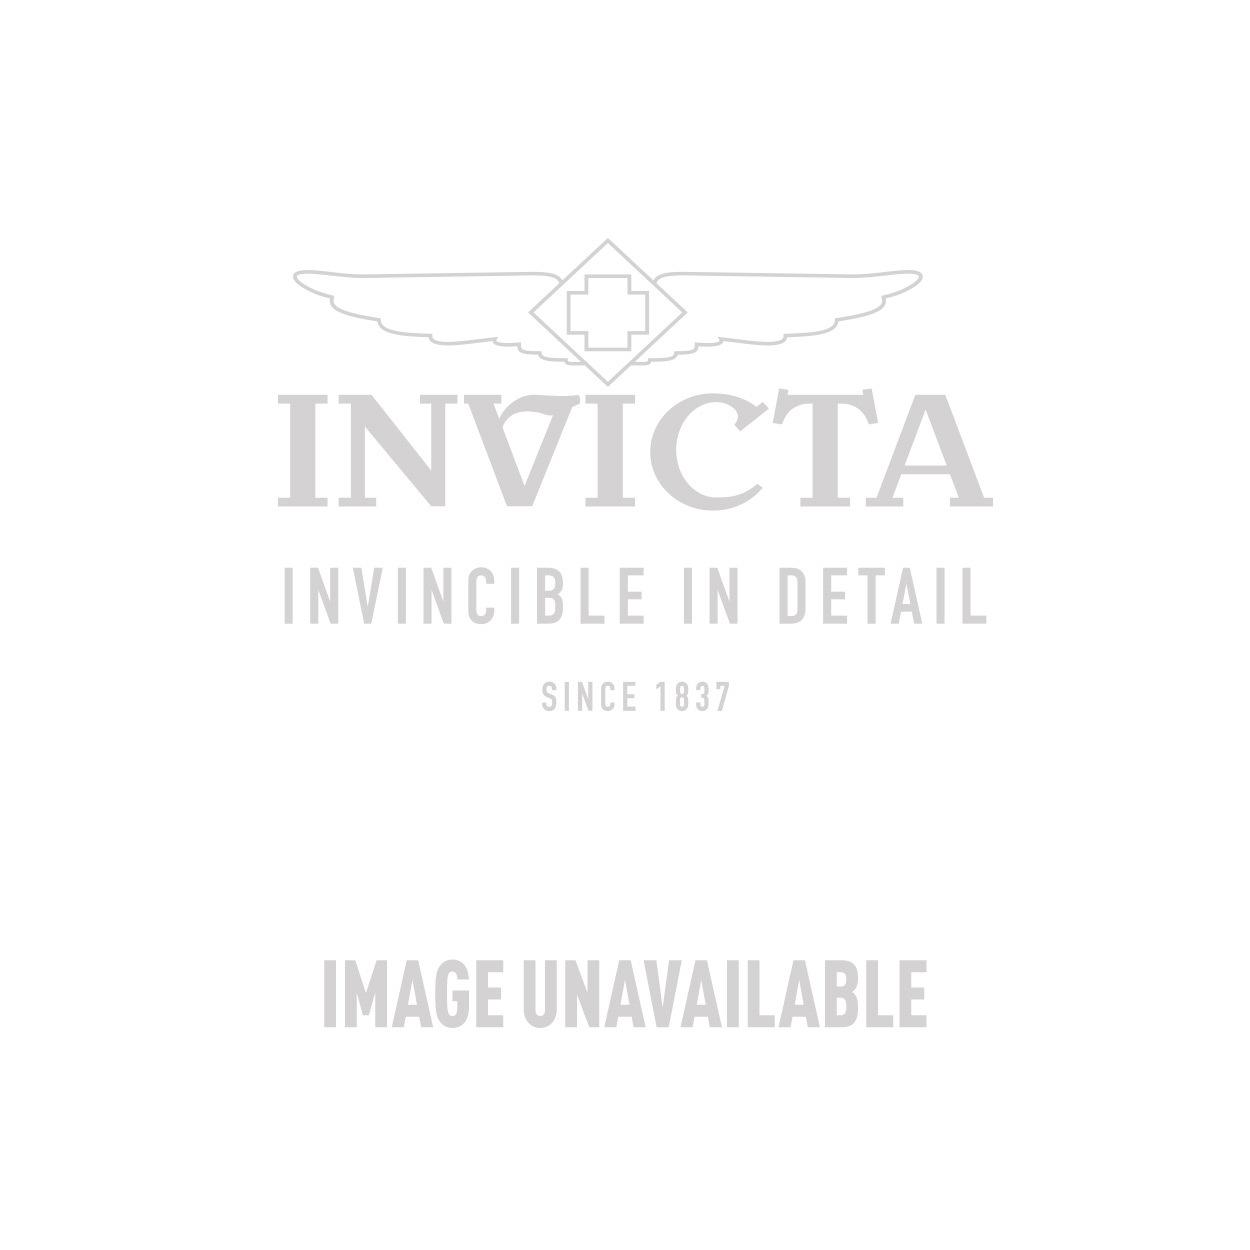 Invicta JT Quartz Watch - Black case with Black tone Kevlar band - Model  13051